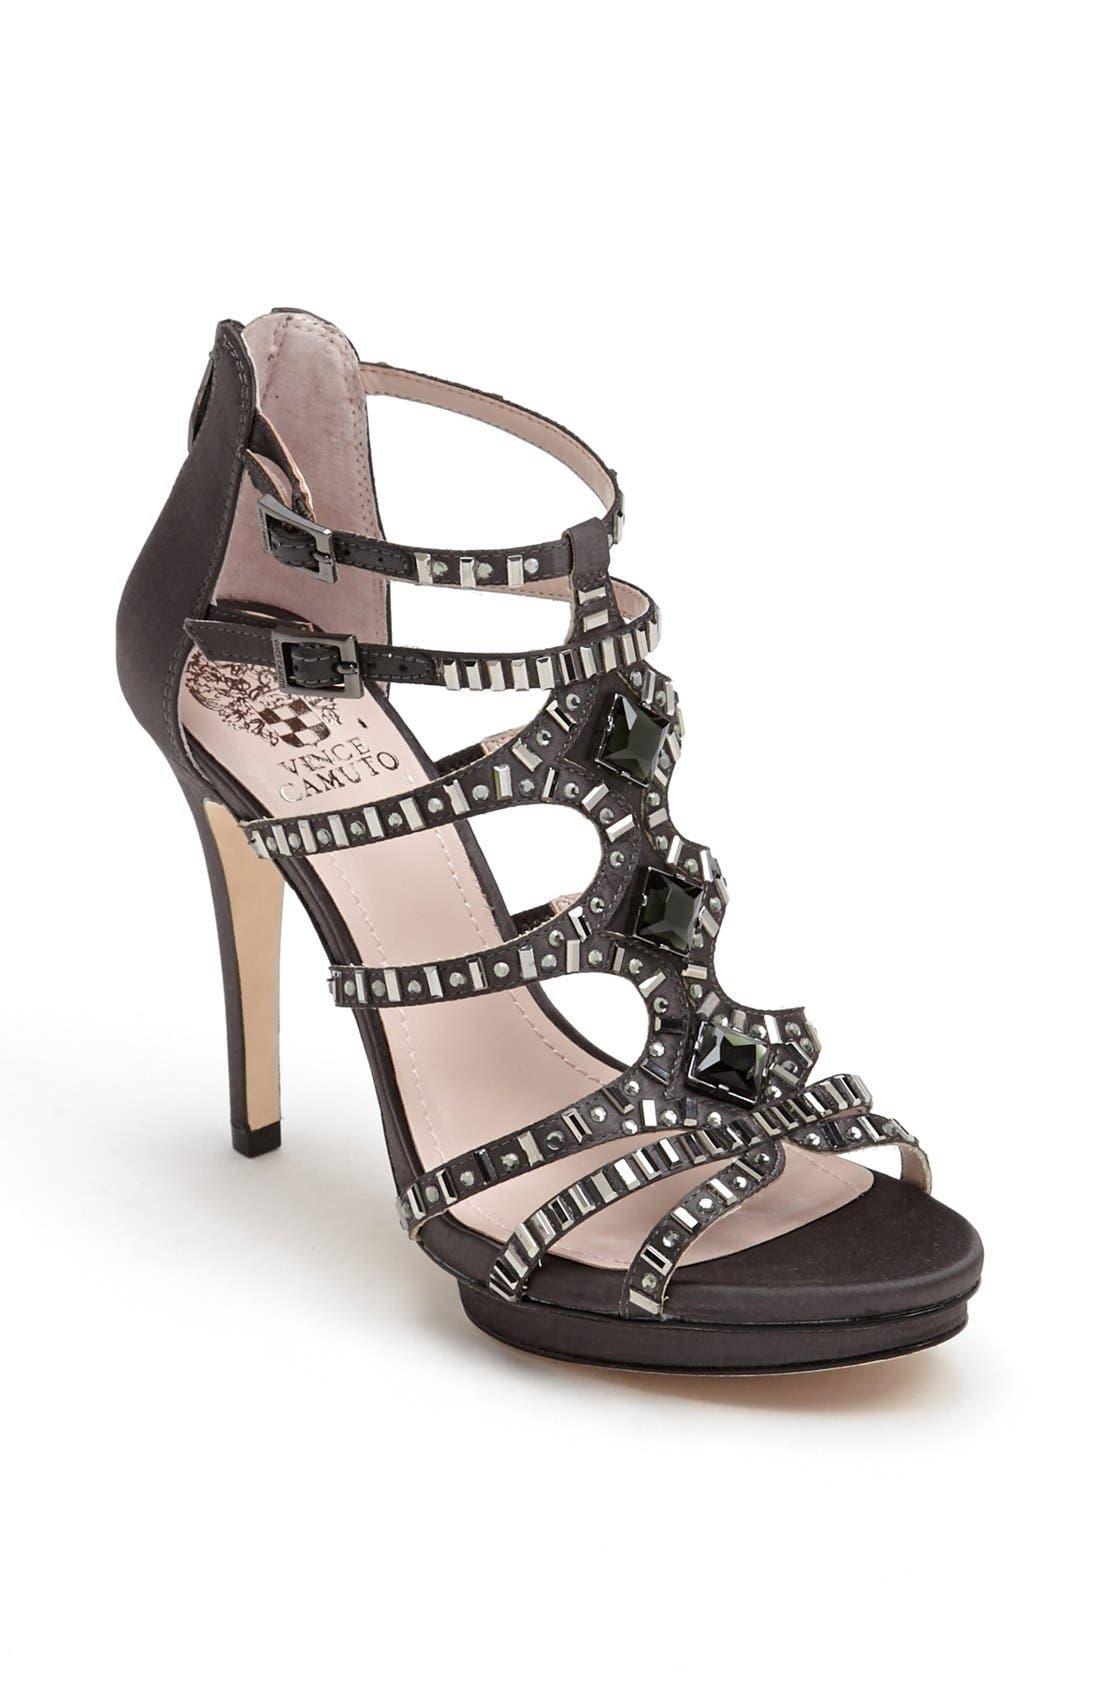 Alternate Image 1 Selected - Vince Camuto 'Crista' Sandal